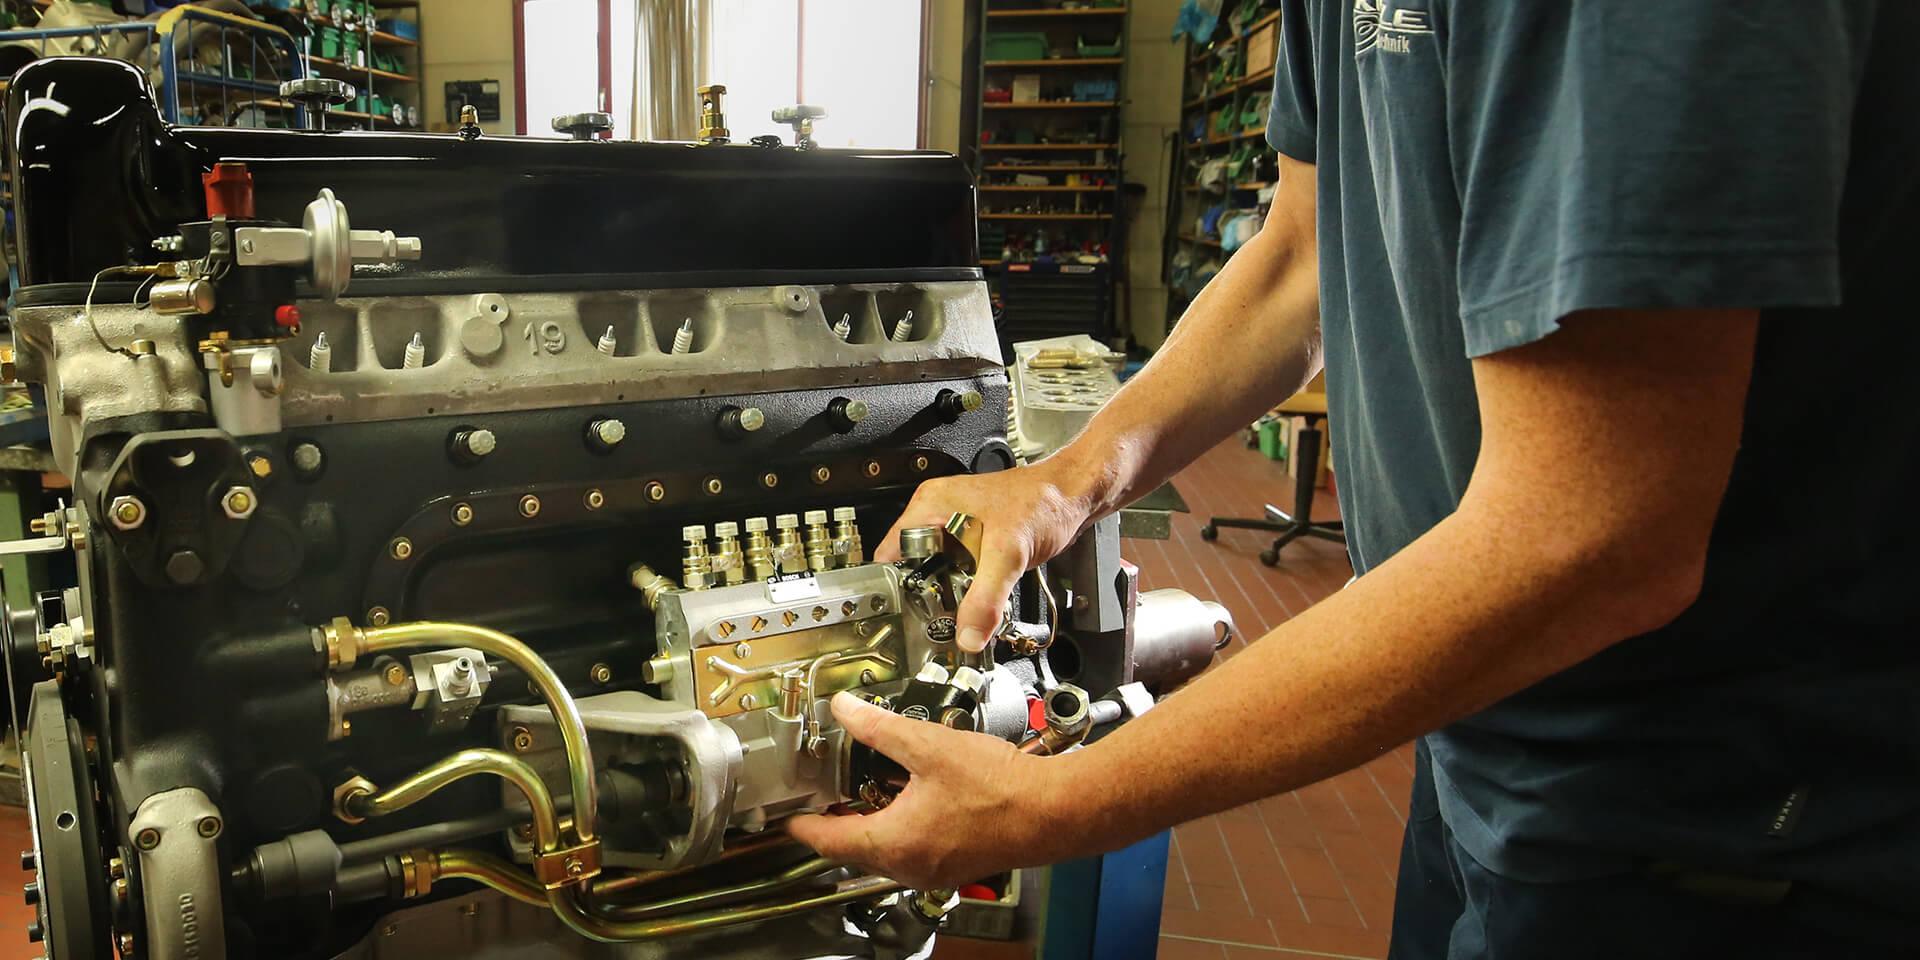 Vintage Mercedes-Benz car engine reconditioning